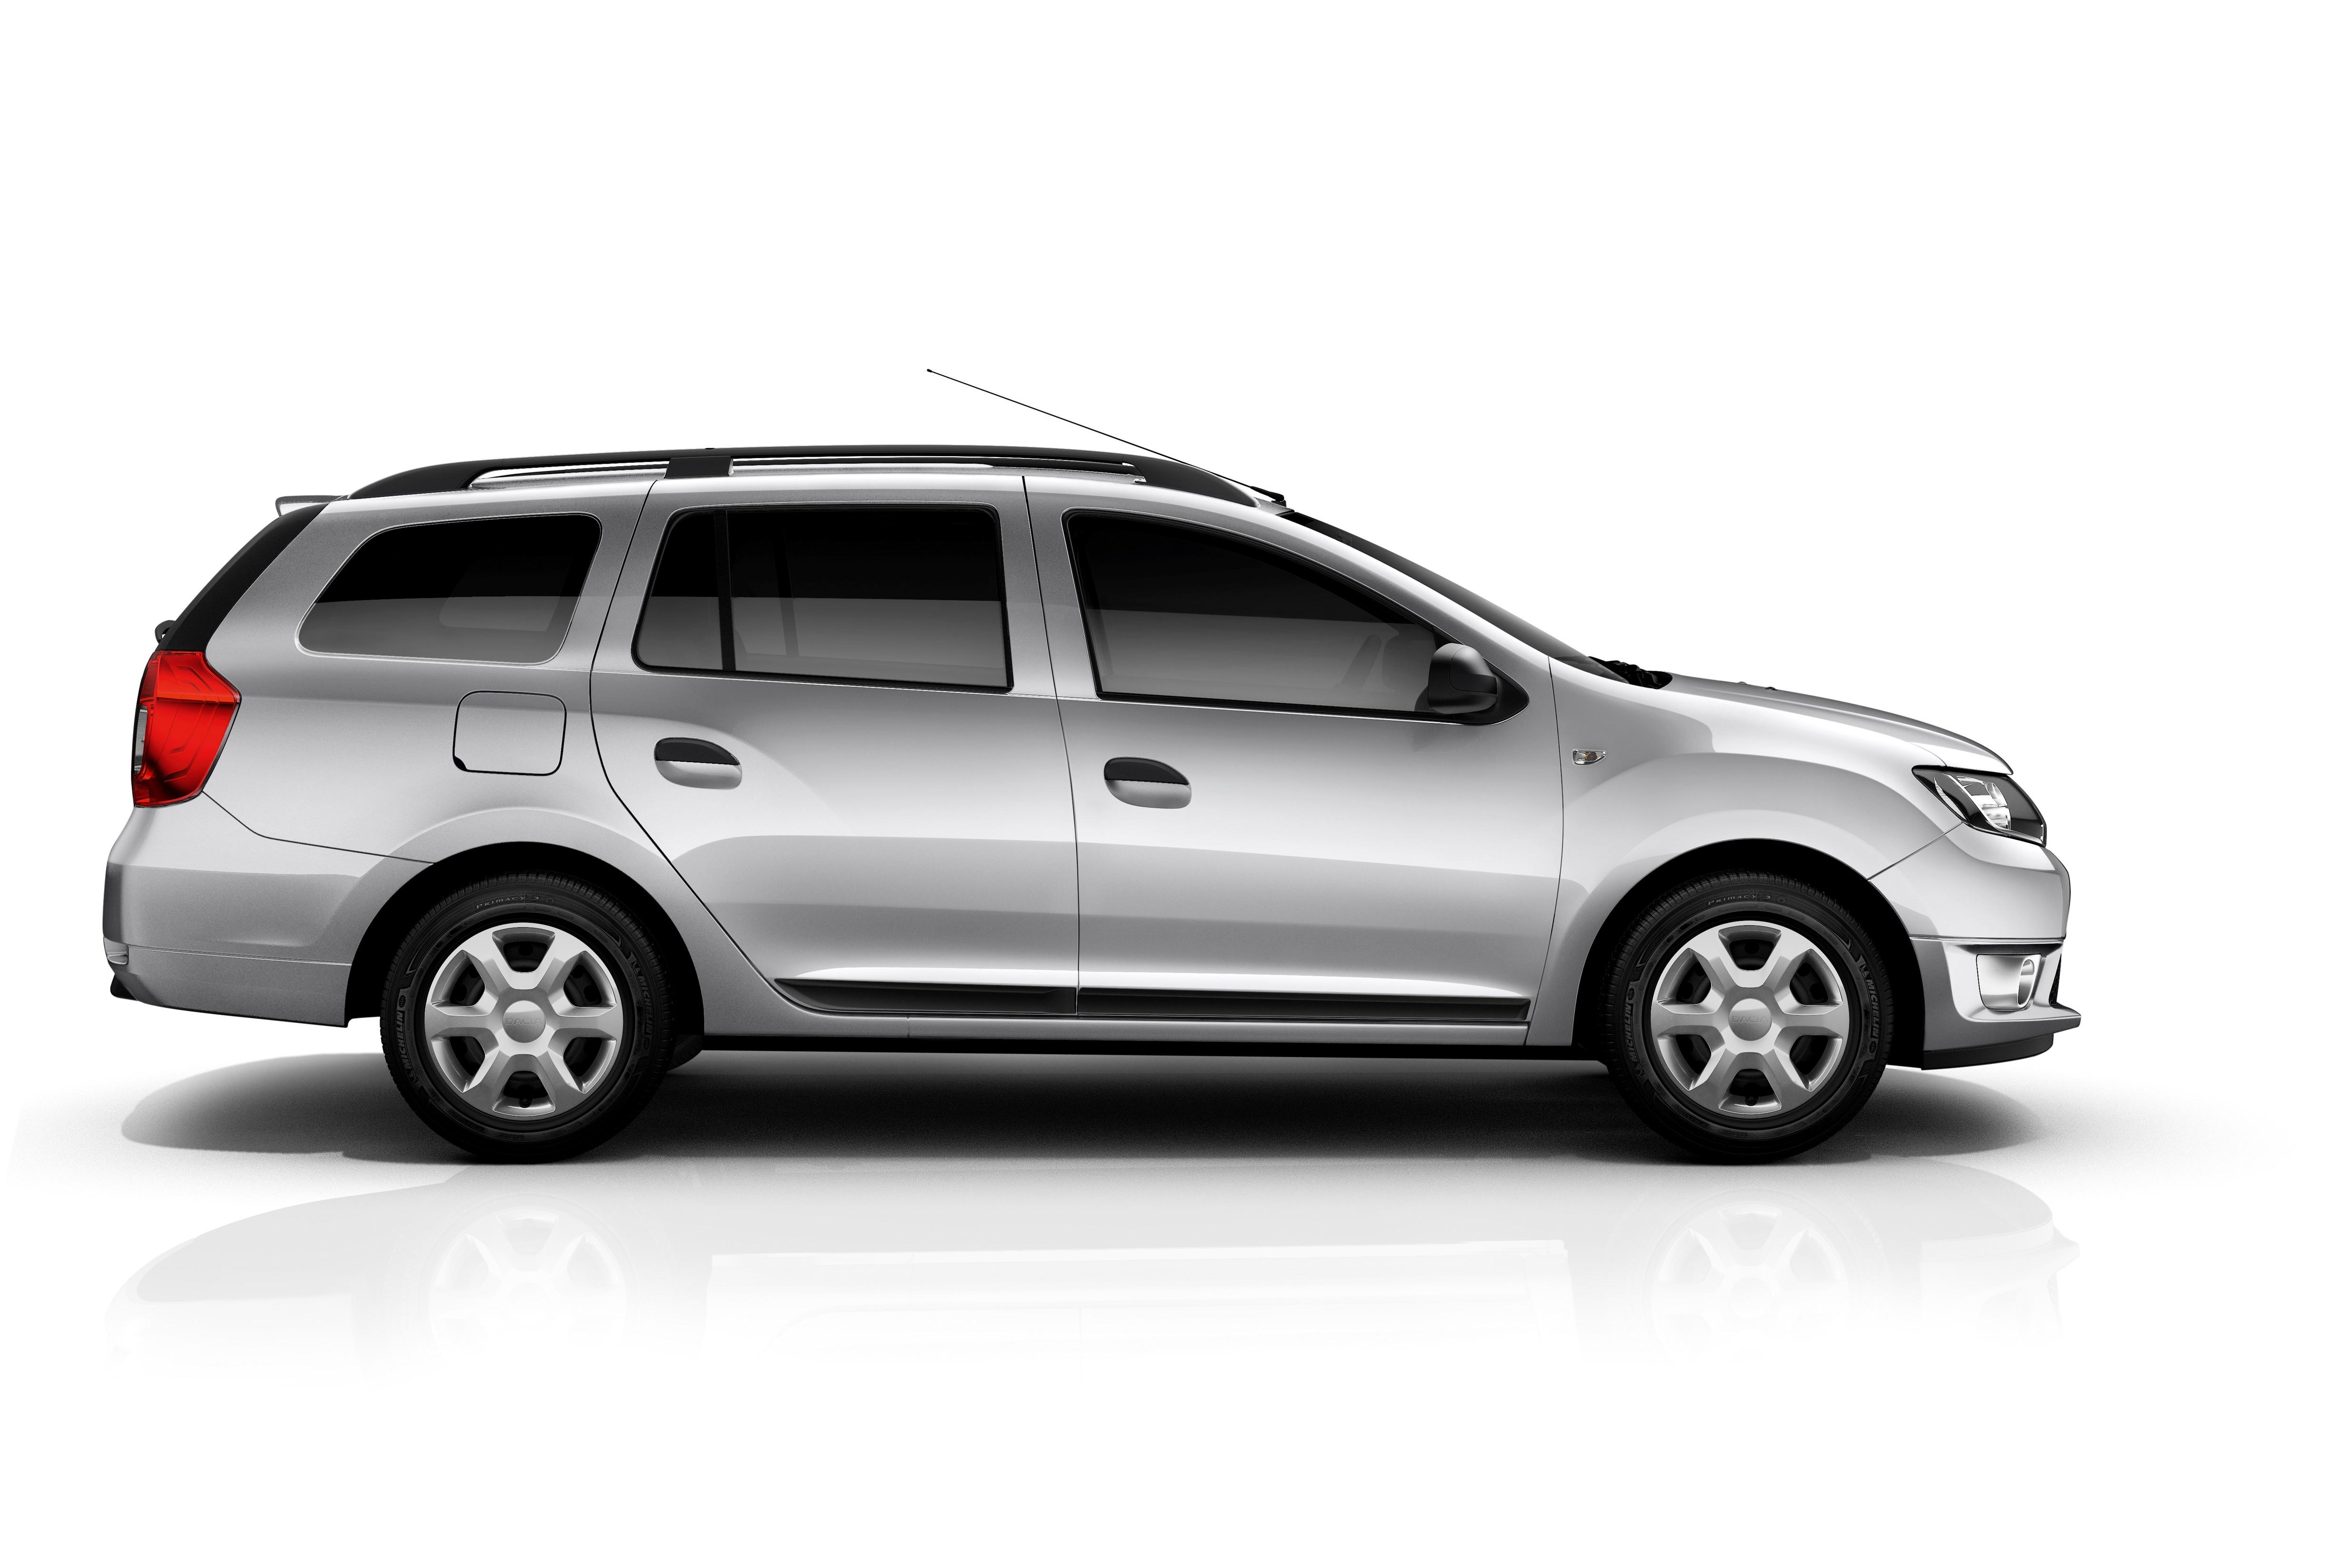 Wallpaper 2013 Sedan Dacia Netcarshow Netcar Car